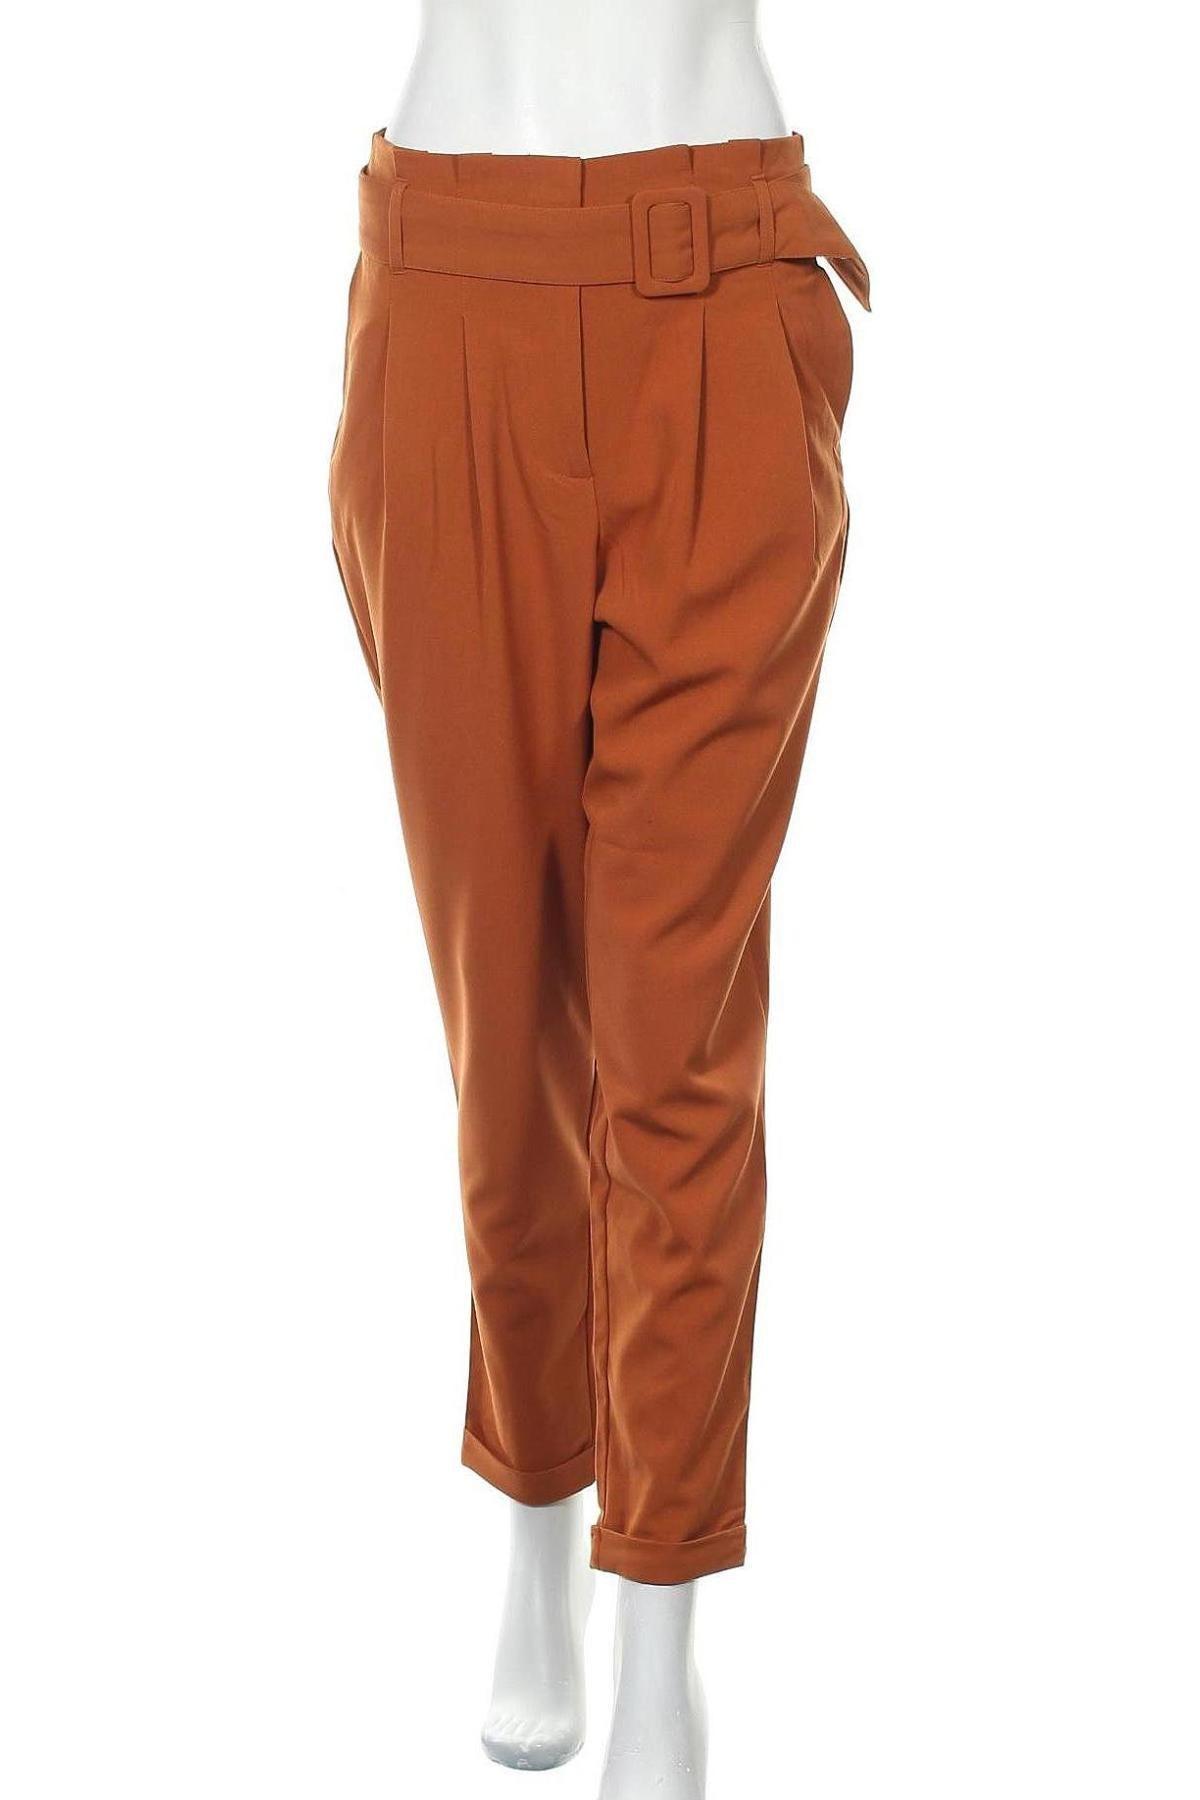 Дамски панталон ONLY, Размер M, Цвят Кафяв, 63% полиестер, 33% вискоза, 4% еластан, Цена 33,63лв.